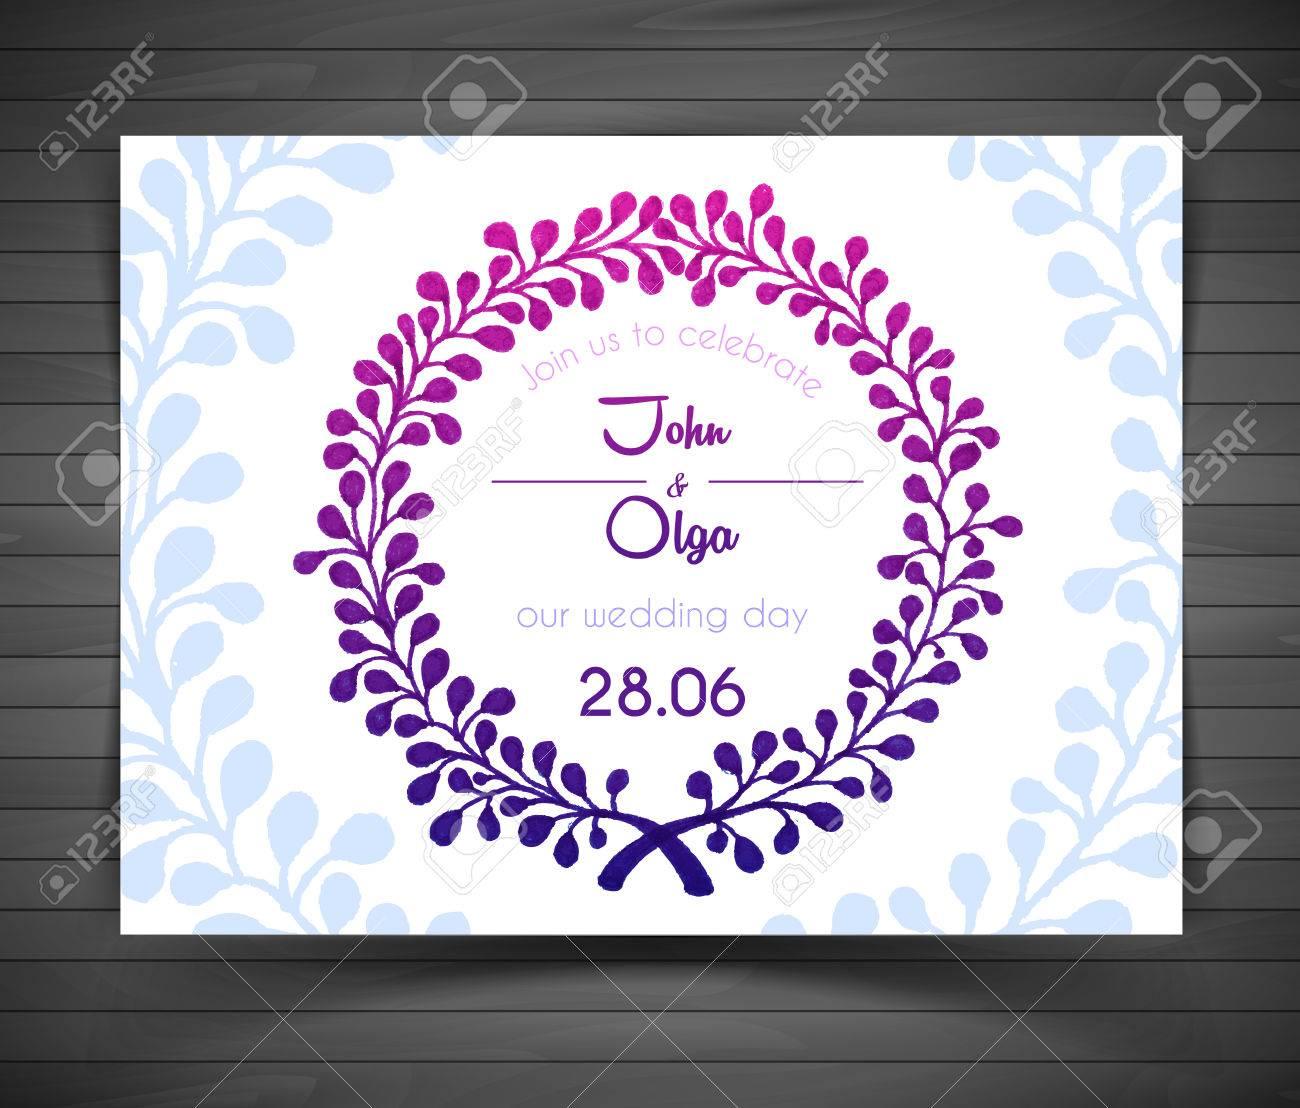 Illustration of Wedding card - 27679357